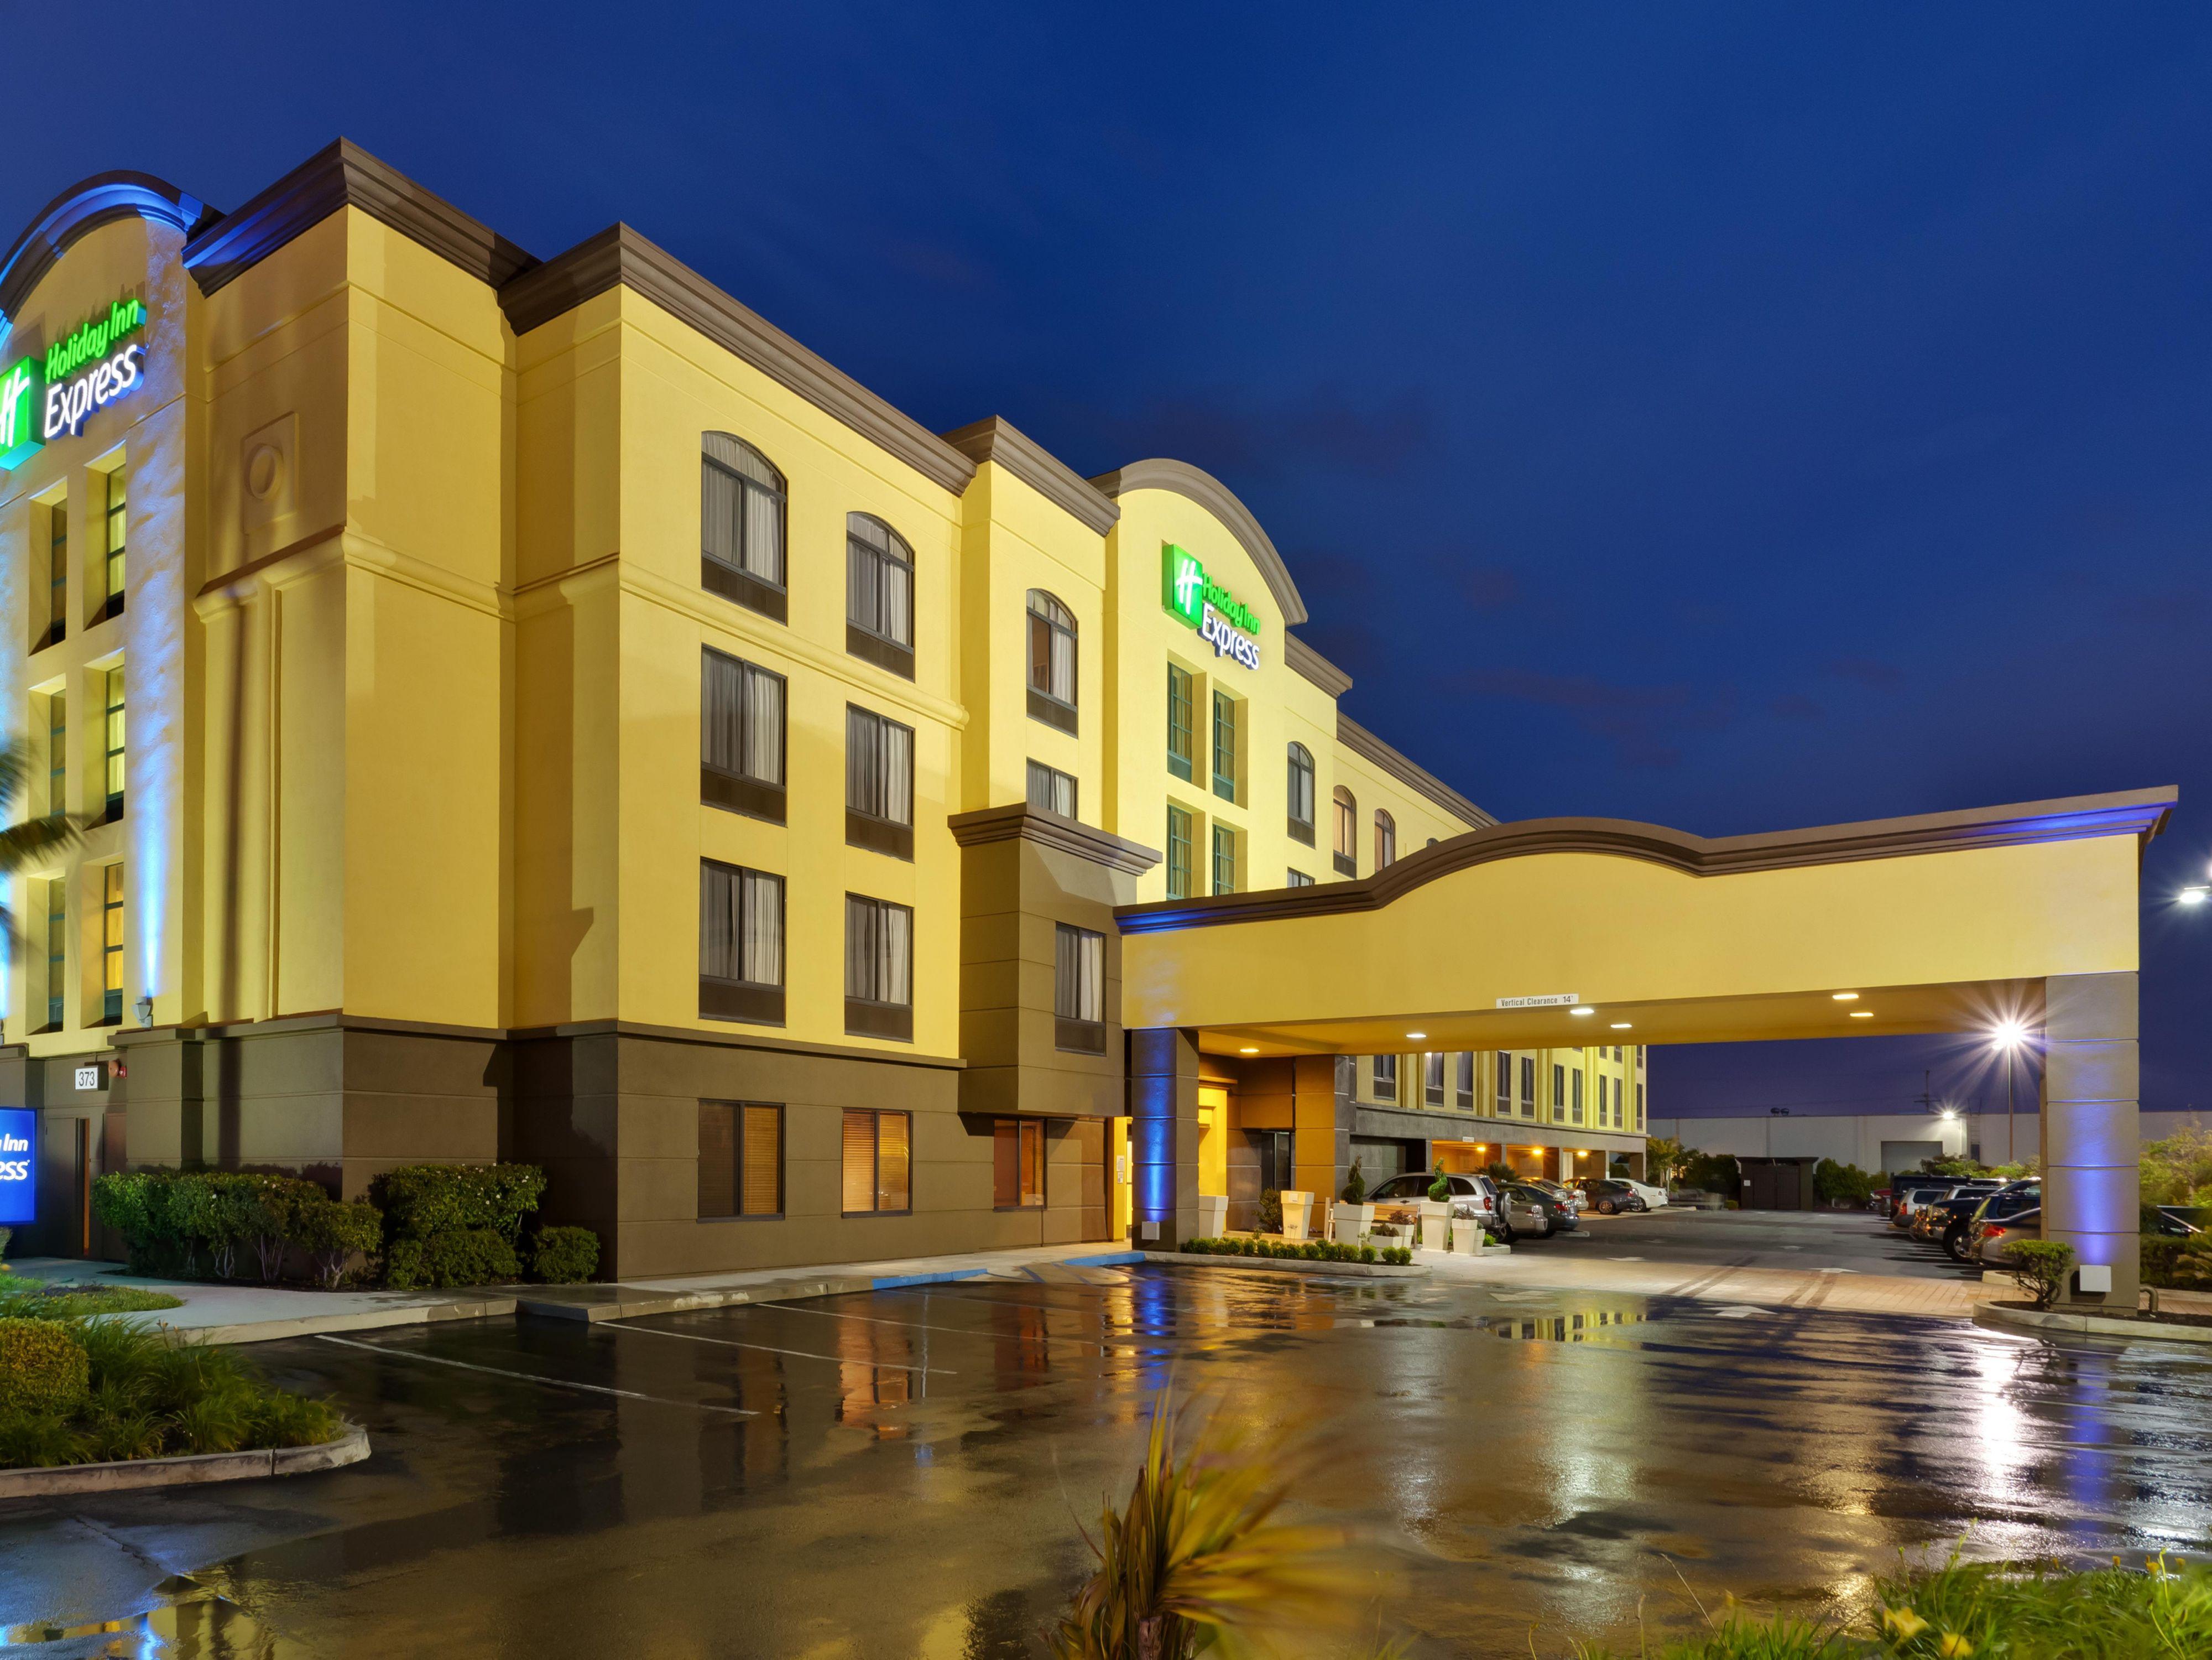 Affordable Hotels Near San Francisco Airport Holiday Inn Express San Francisco Airport North